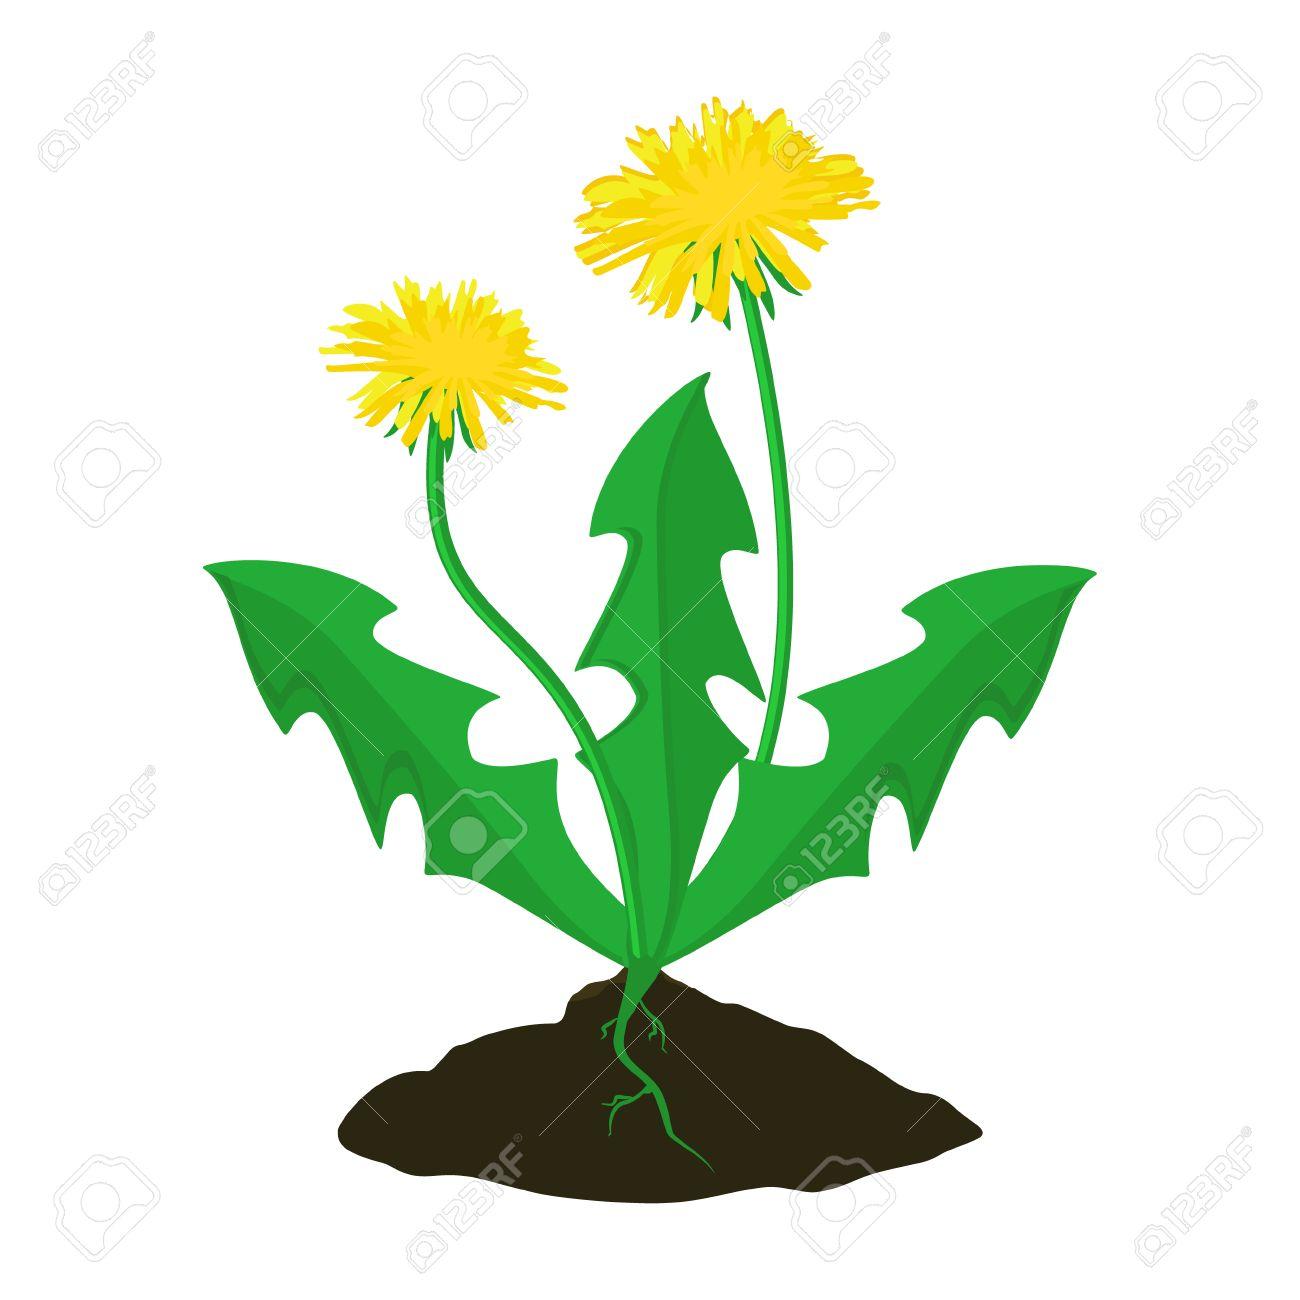 vector illustration summer flower yellow dandelion dandelion rh 123rf com dandelion vector png dandelion vector artwork